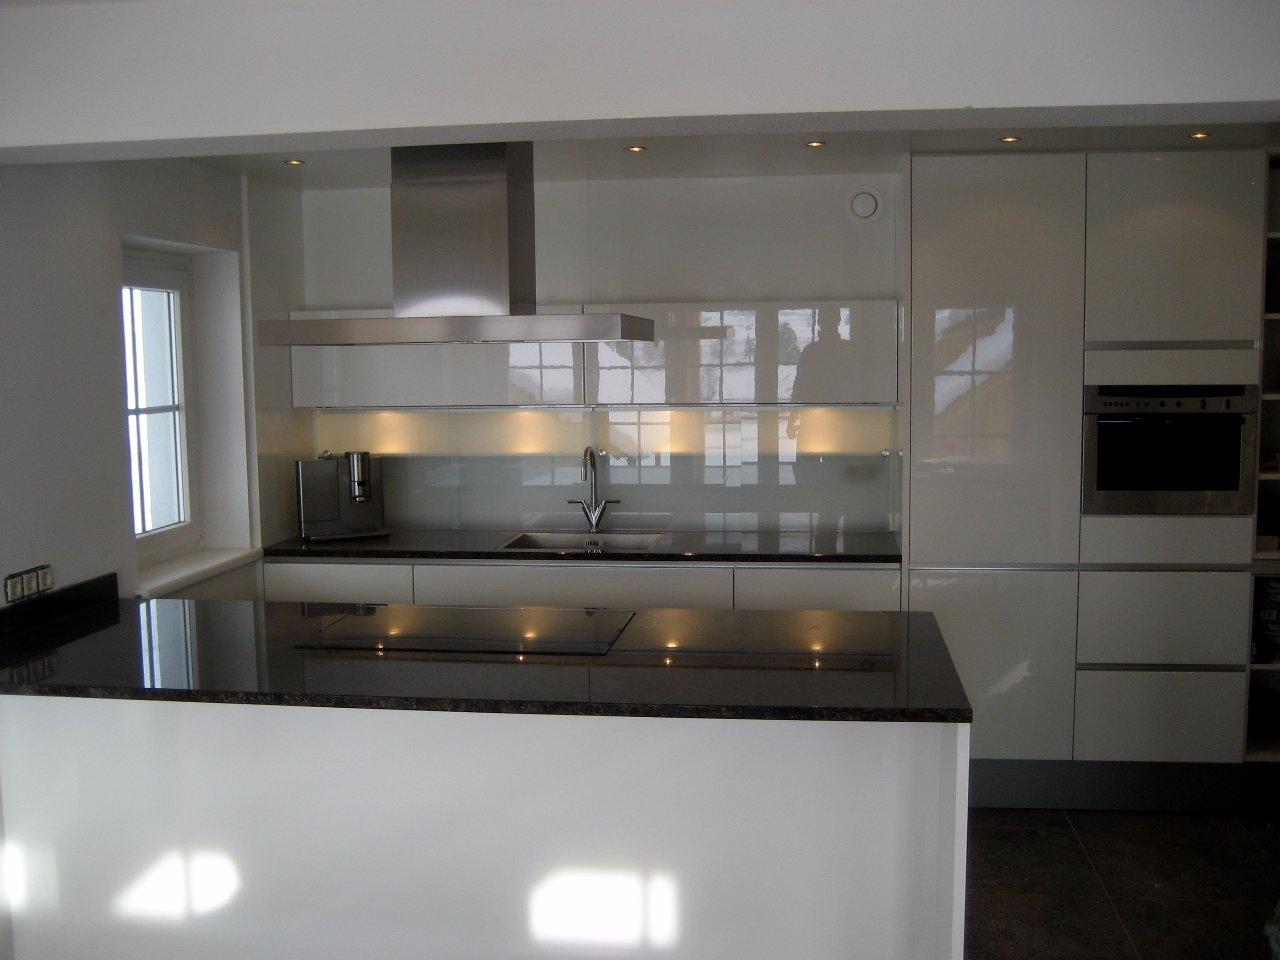 Hoogglans Witte Keuken : Keukens archieven jarin